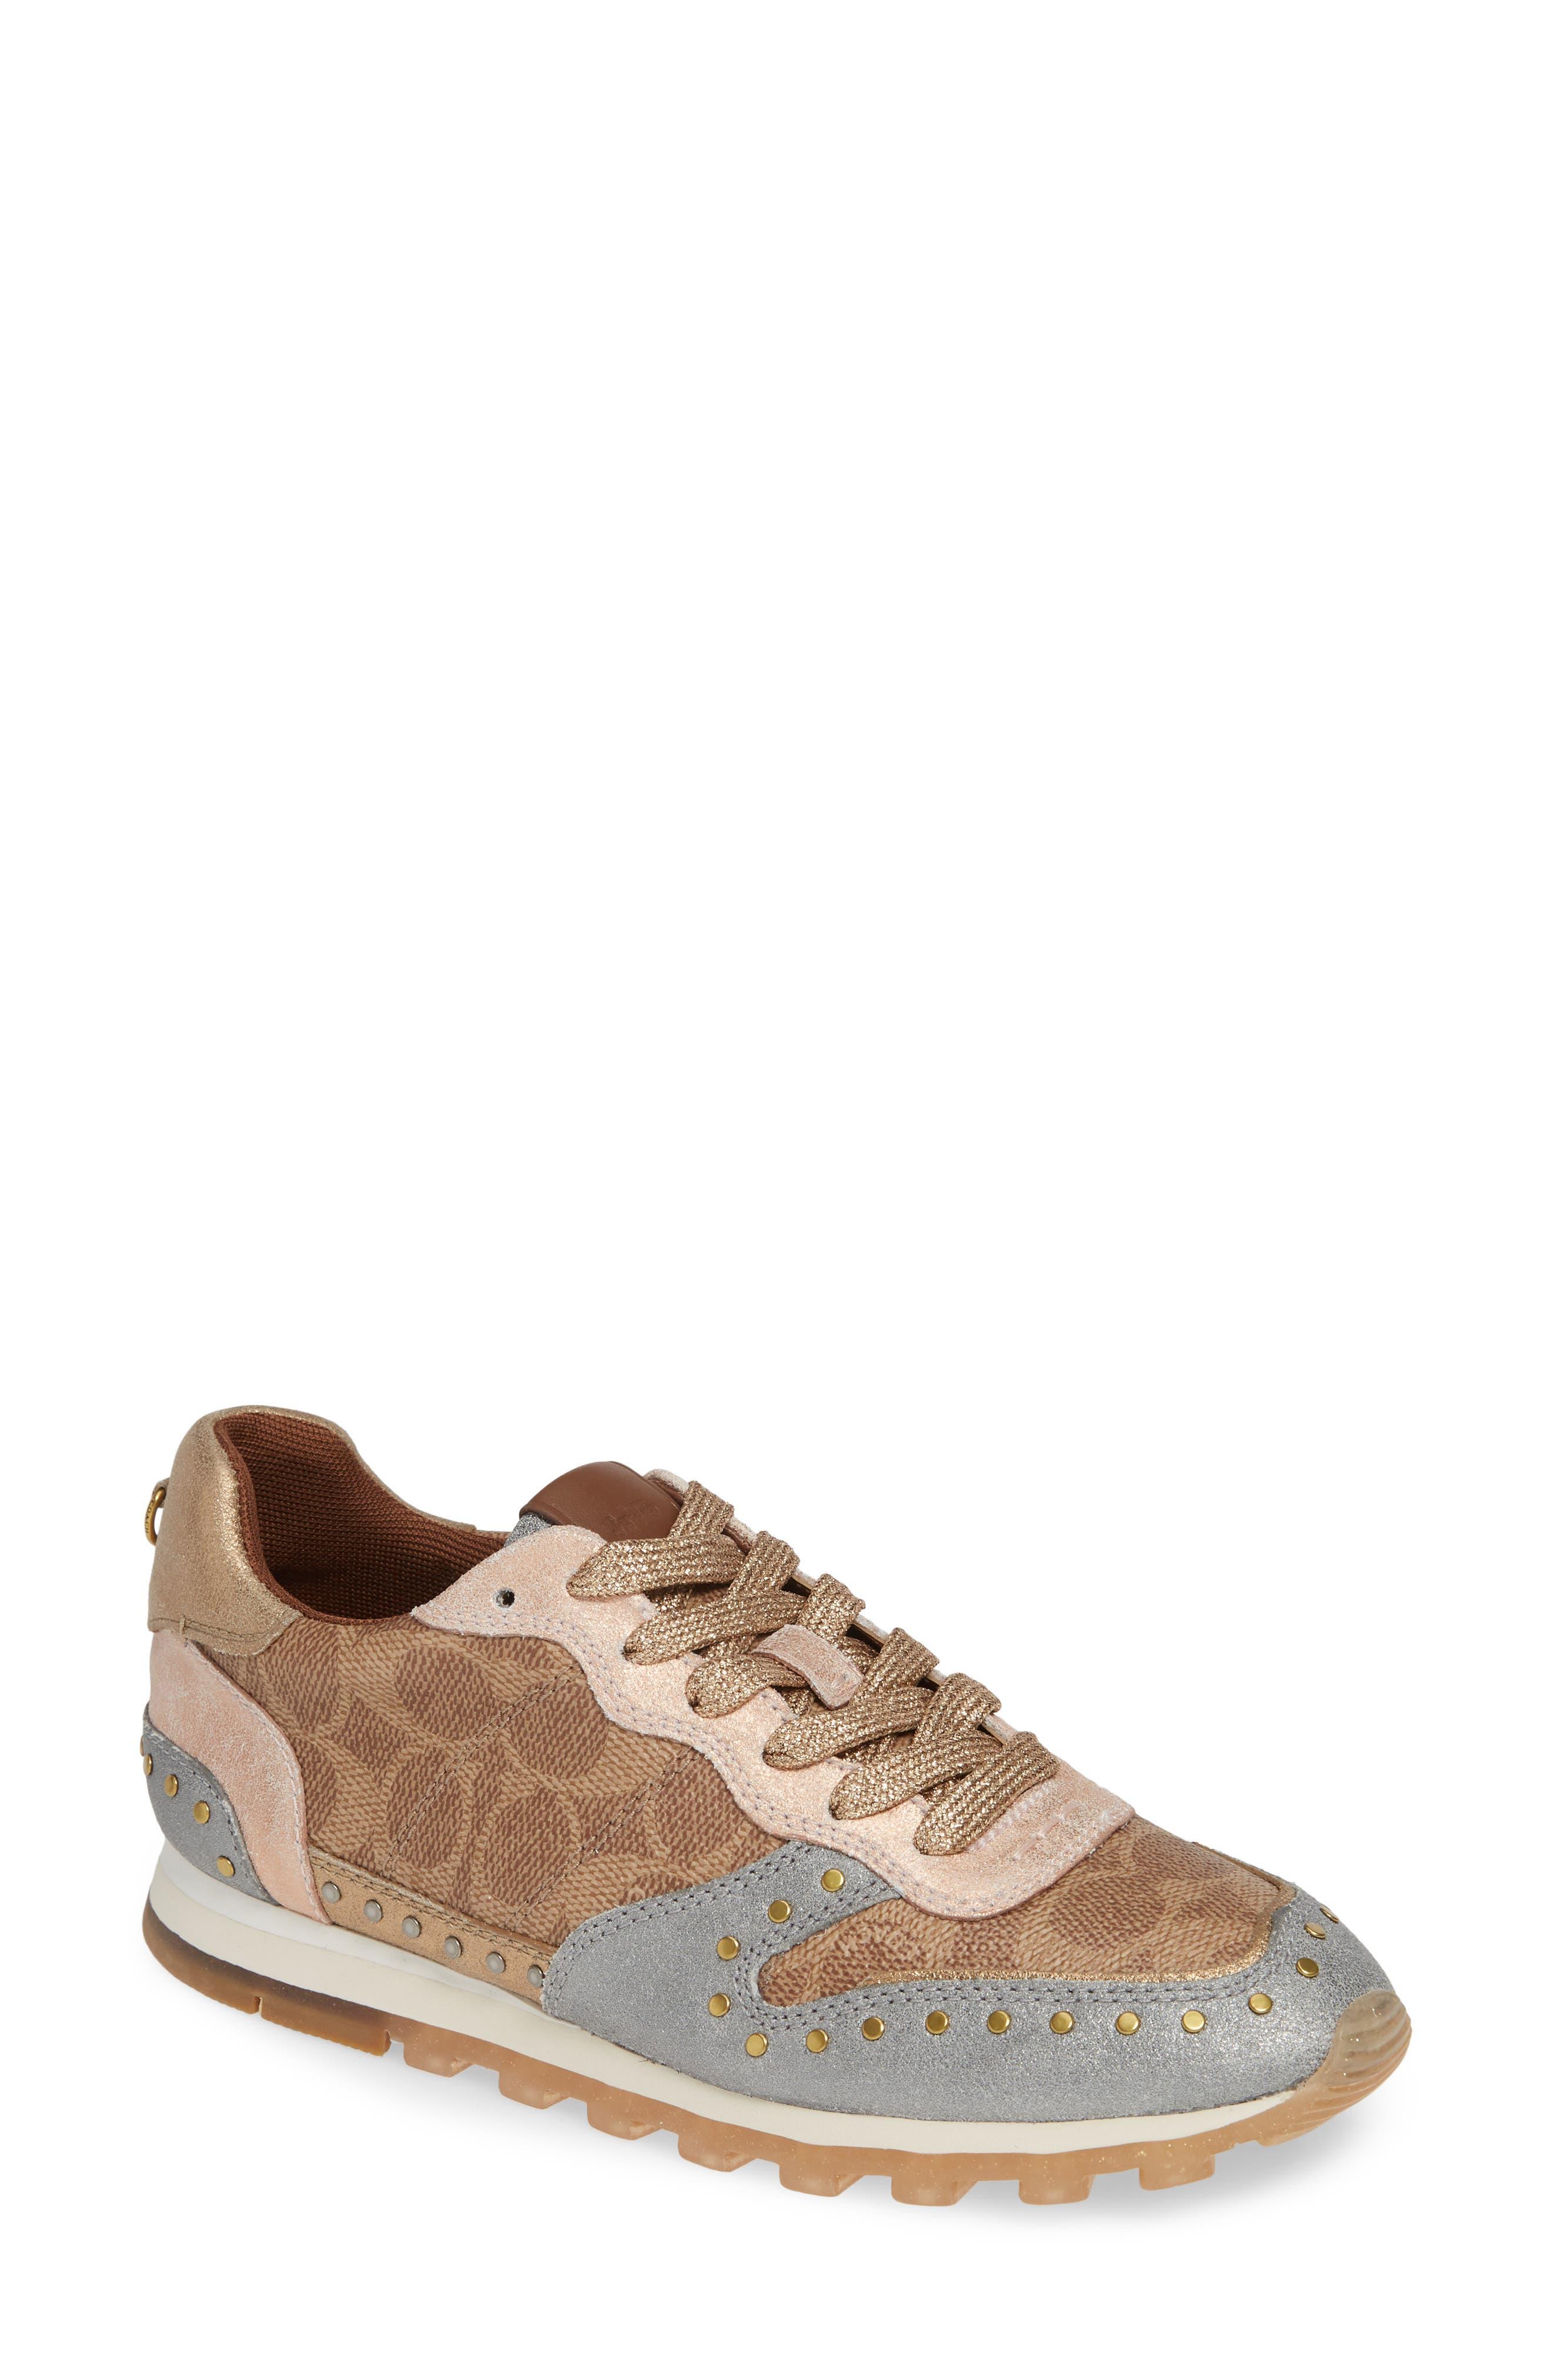 COACH C118 Studded Sneaker, Main, color, TAN/ GOLD MULTI